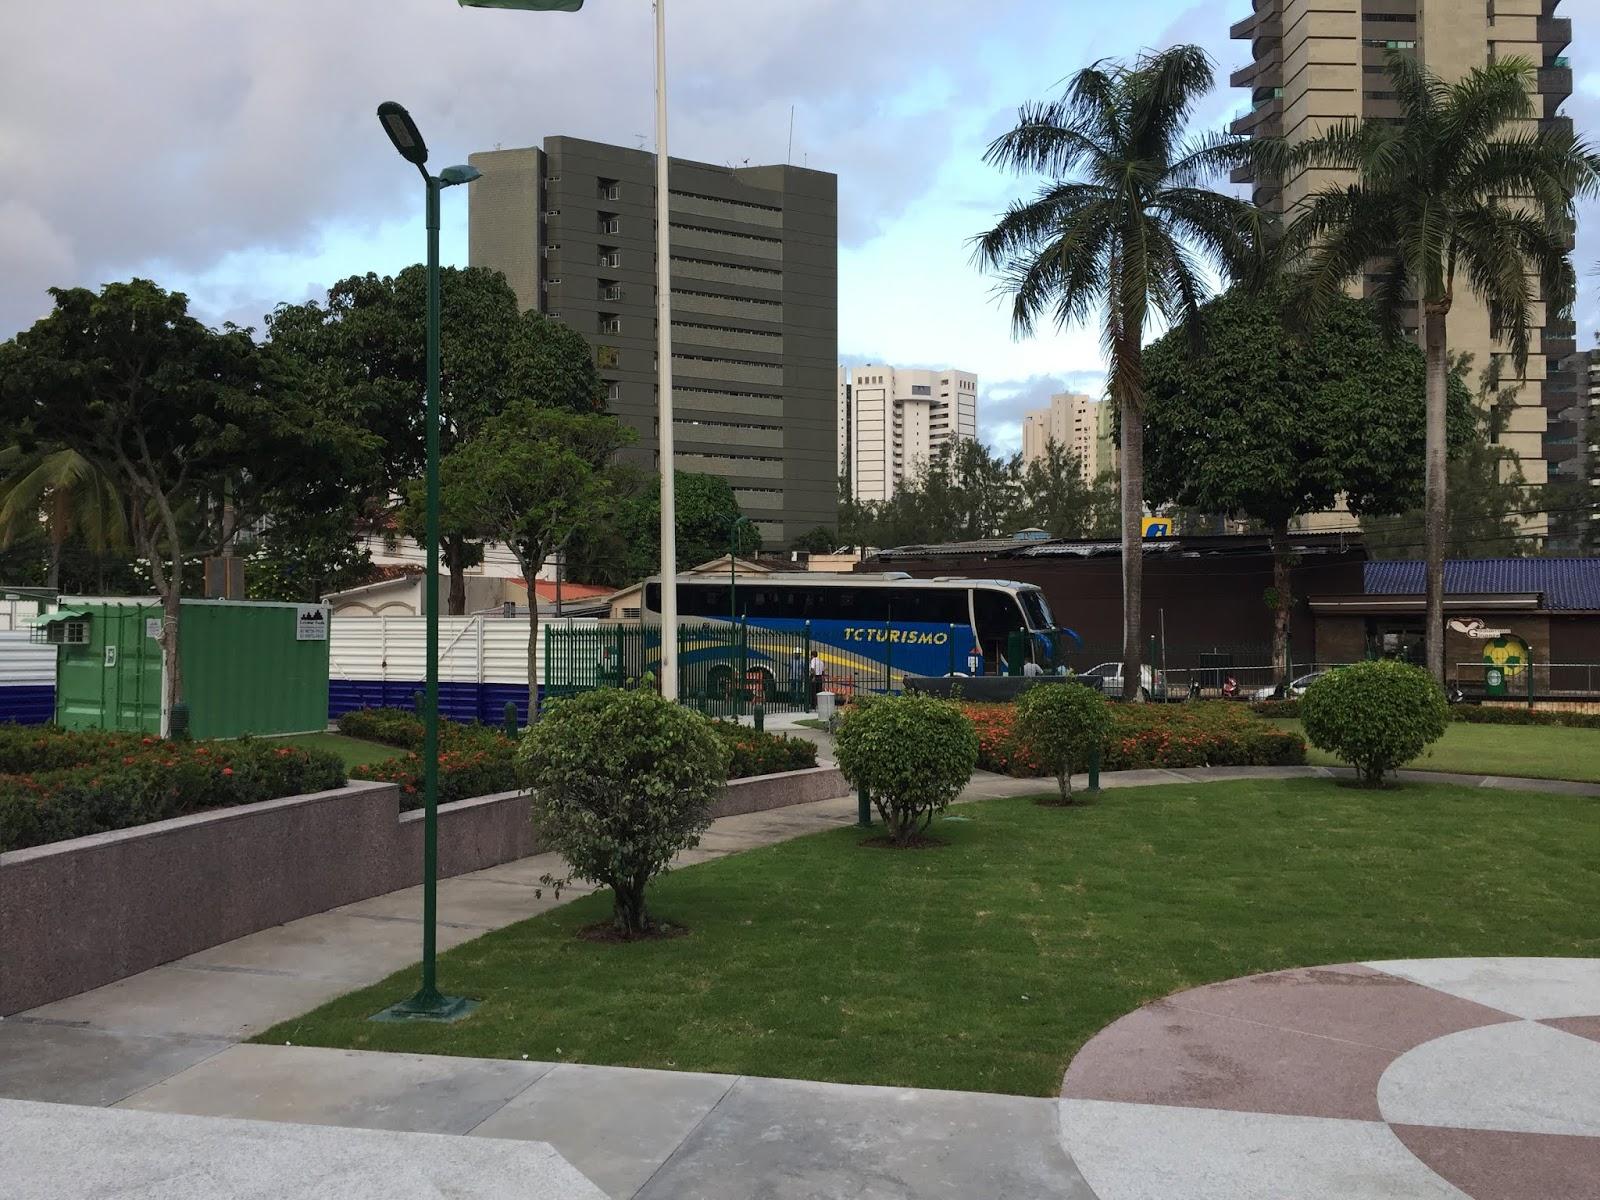 Tidwell's in Brazil: 3 – 9 December 2019: Primary Practice & Primary